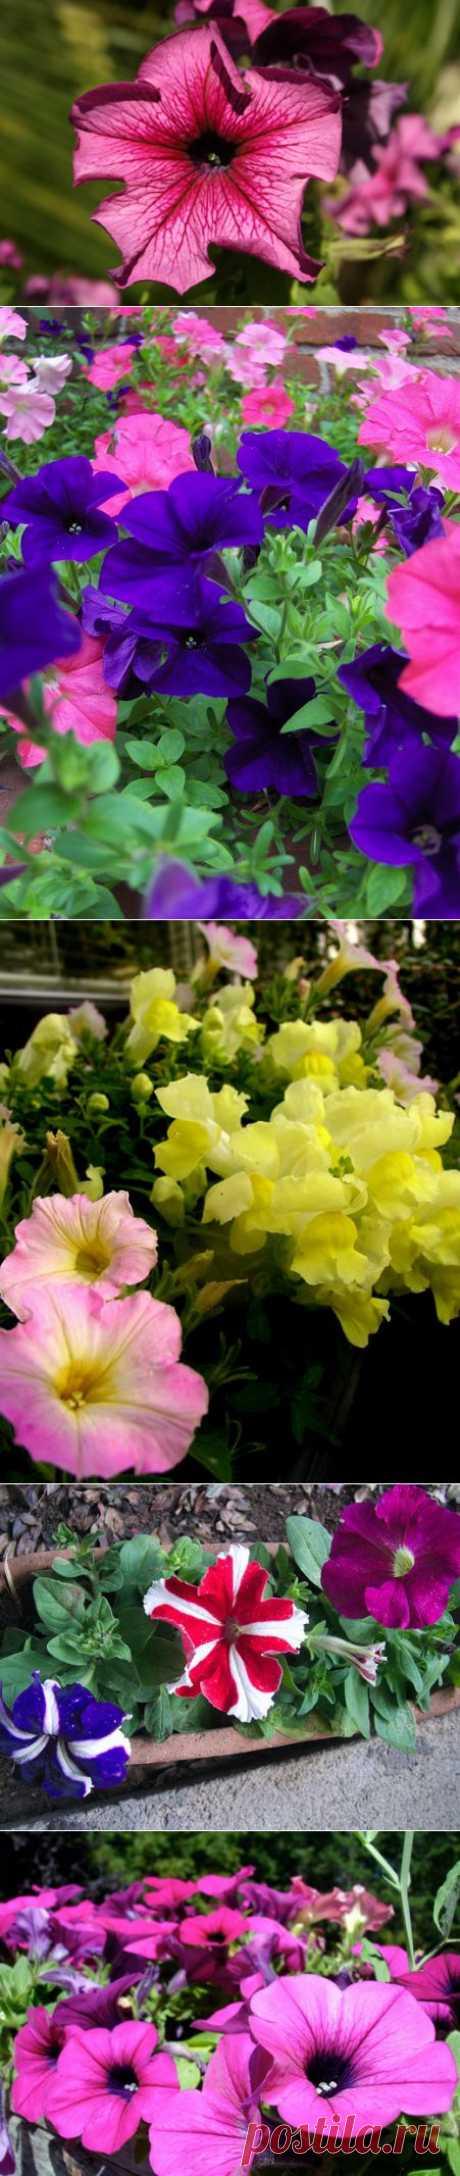 Ботаничка.ru | Петуния. Выращивание, уход, размножение, посадка, использование. Болезни. Цветок. Фото